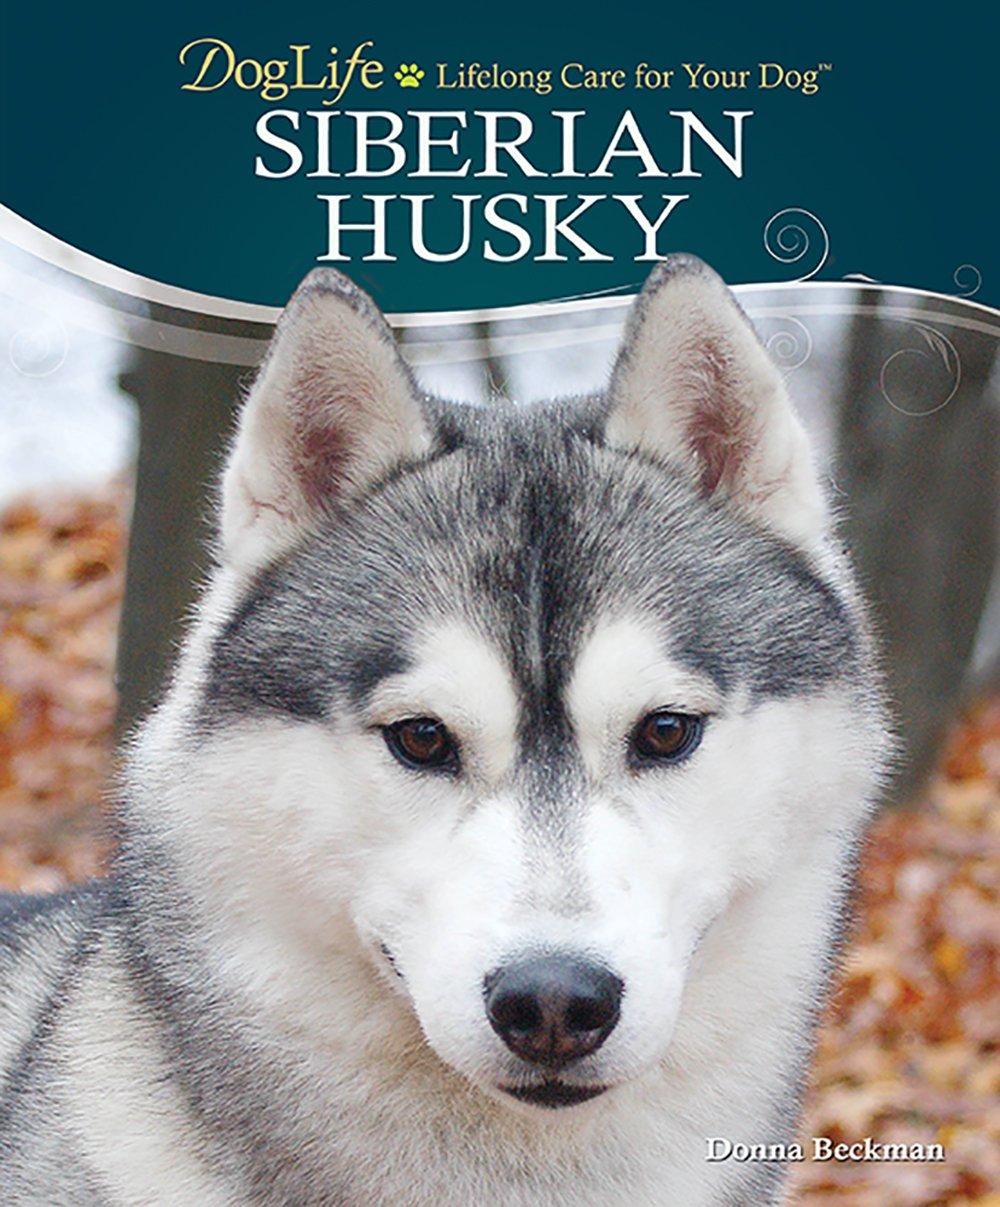 Siberian-Husky-DogLife-Lifelong-Care-for-Your-DogTM